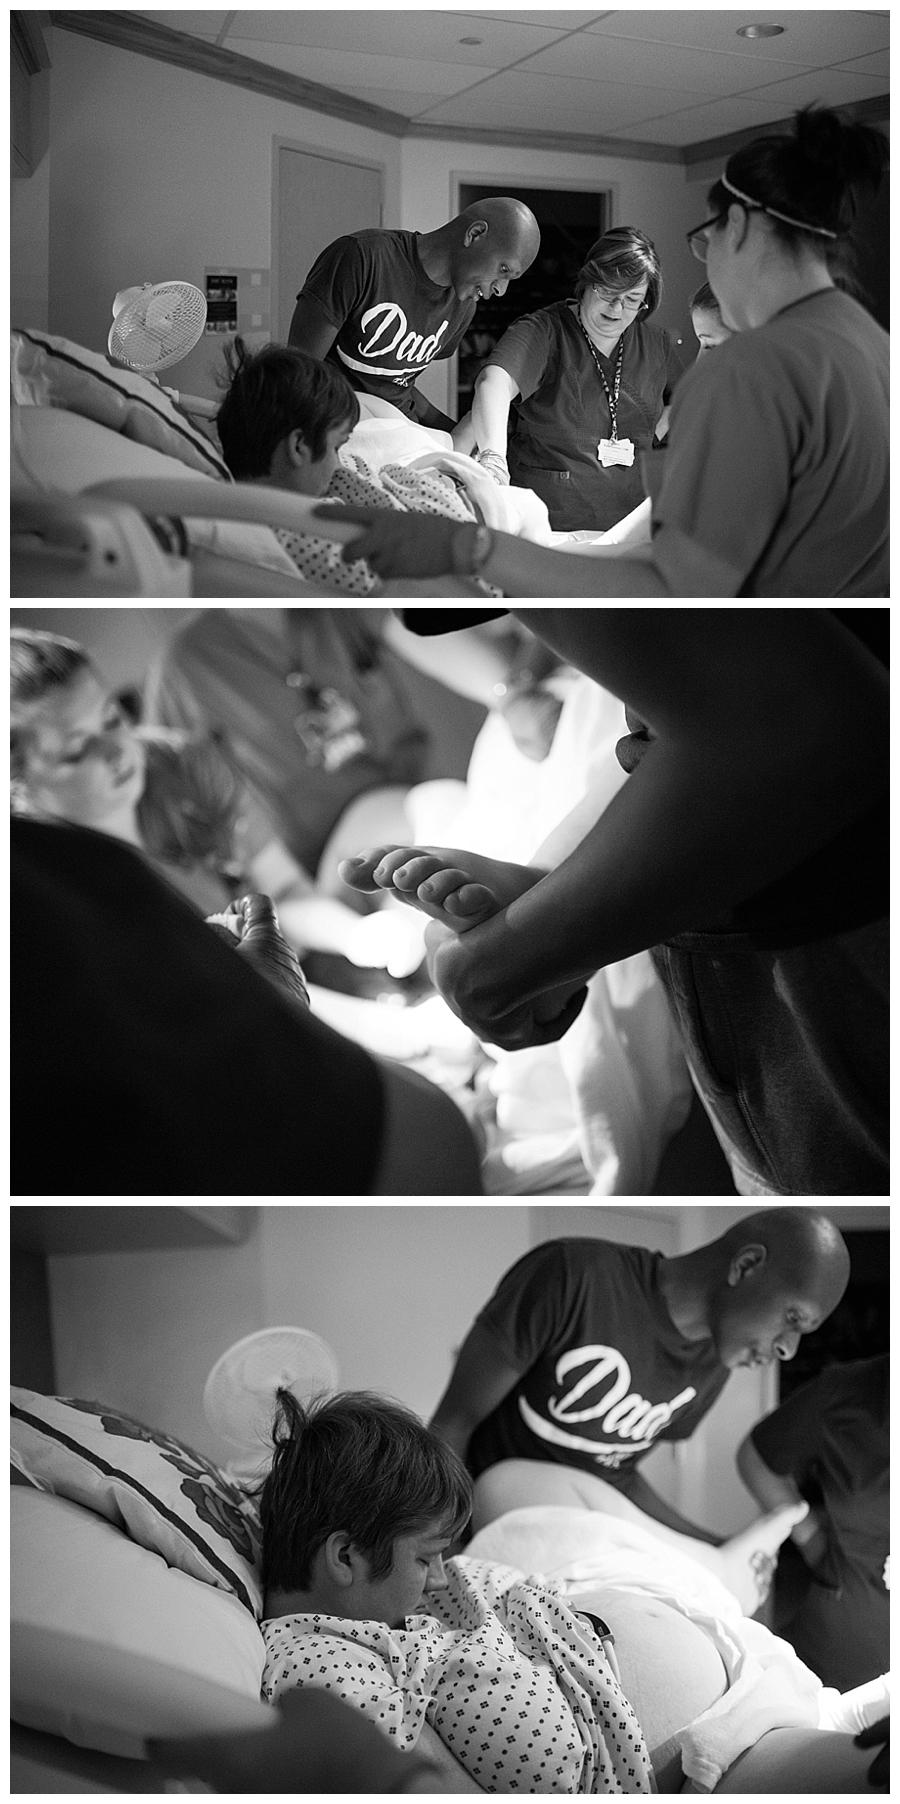 mom-dad-midwife-pushing-hospital-labor